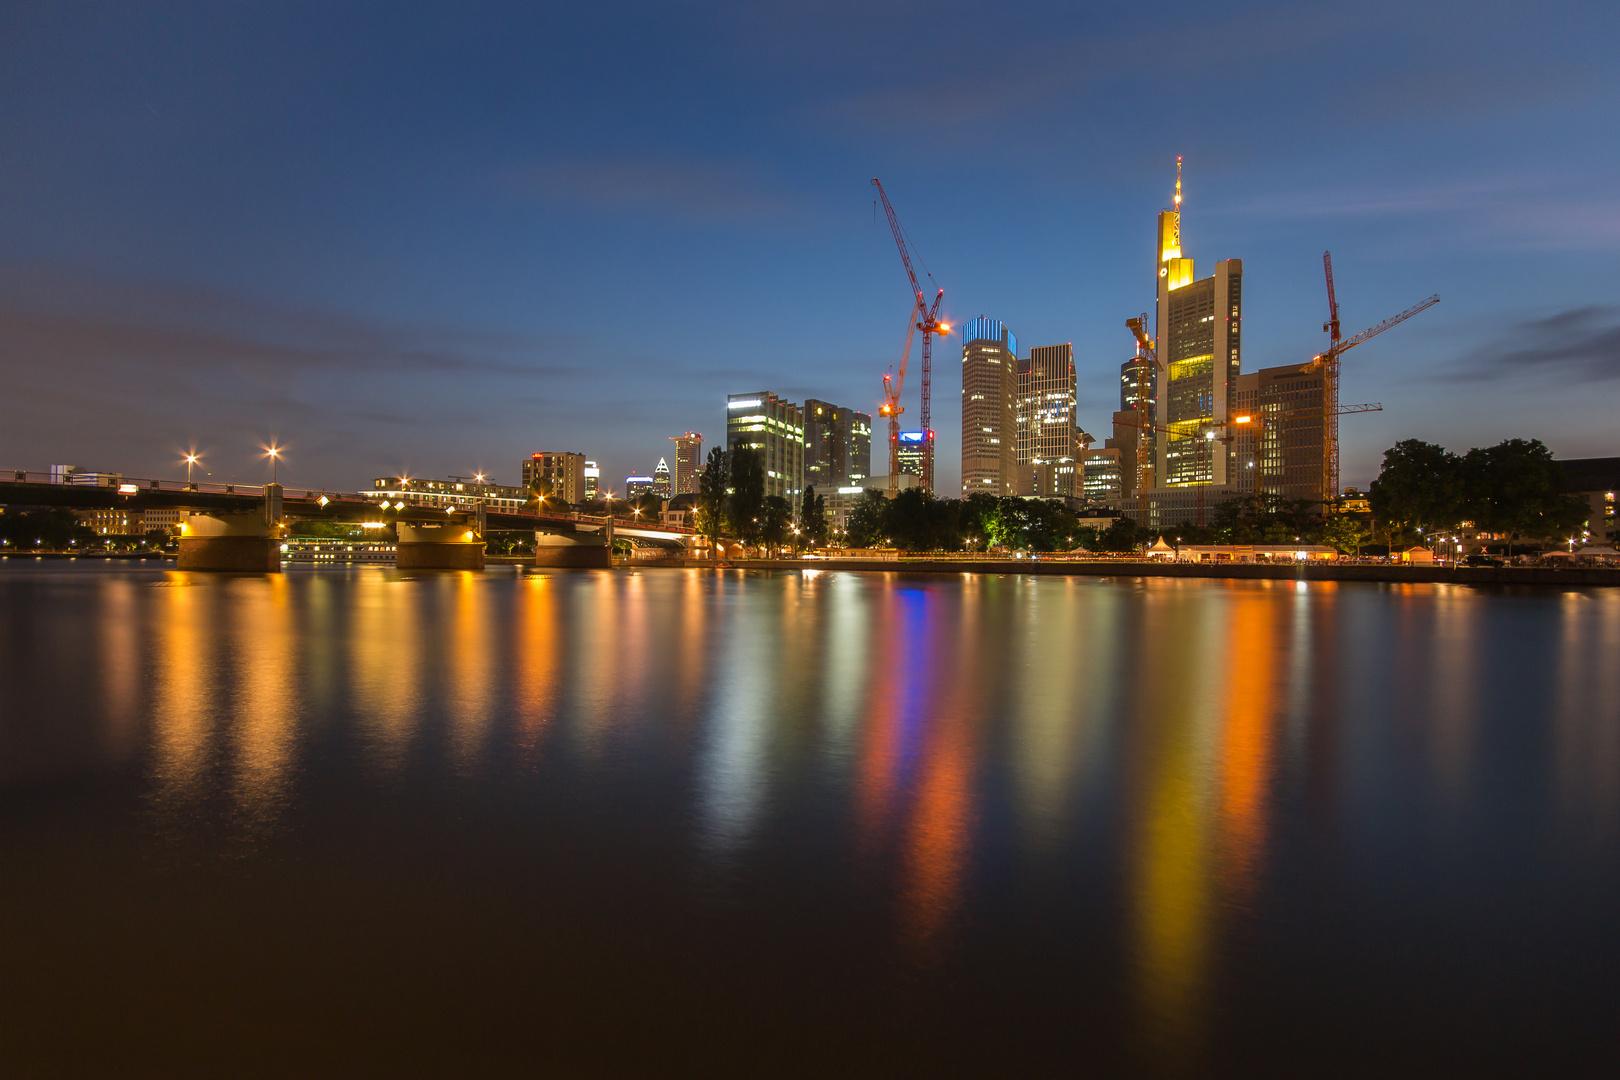 Frankfurt at nights